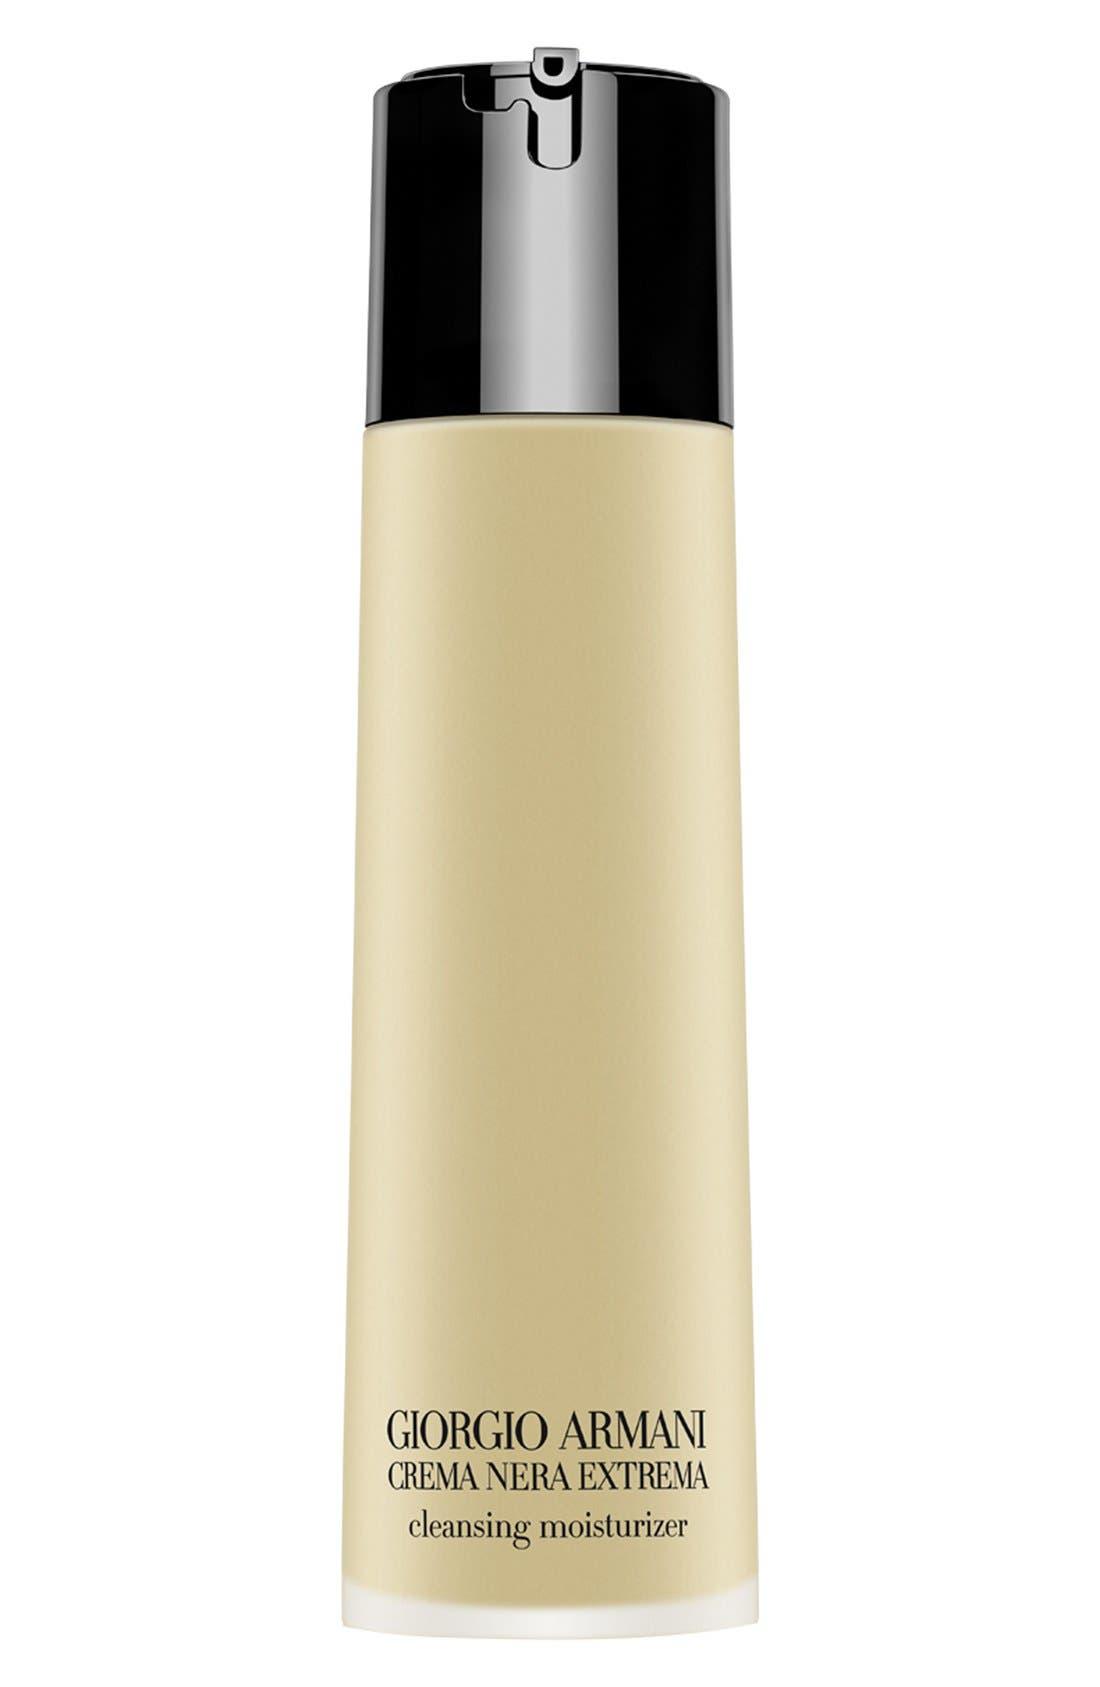 GIORGIO ARMANI 'Crema Nera Extrema' Supreme Balancing Oil-in-Gel Cleansing Moisturizer, Main, color, 000